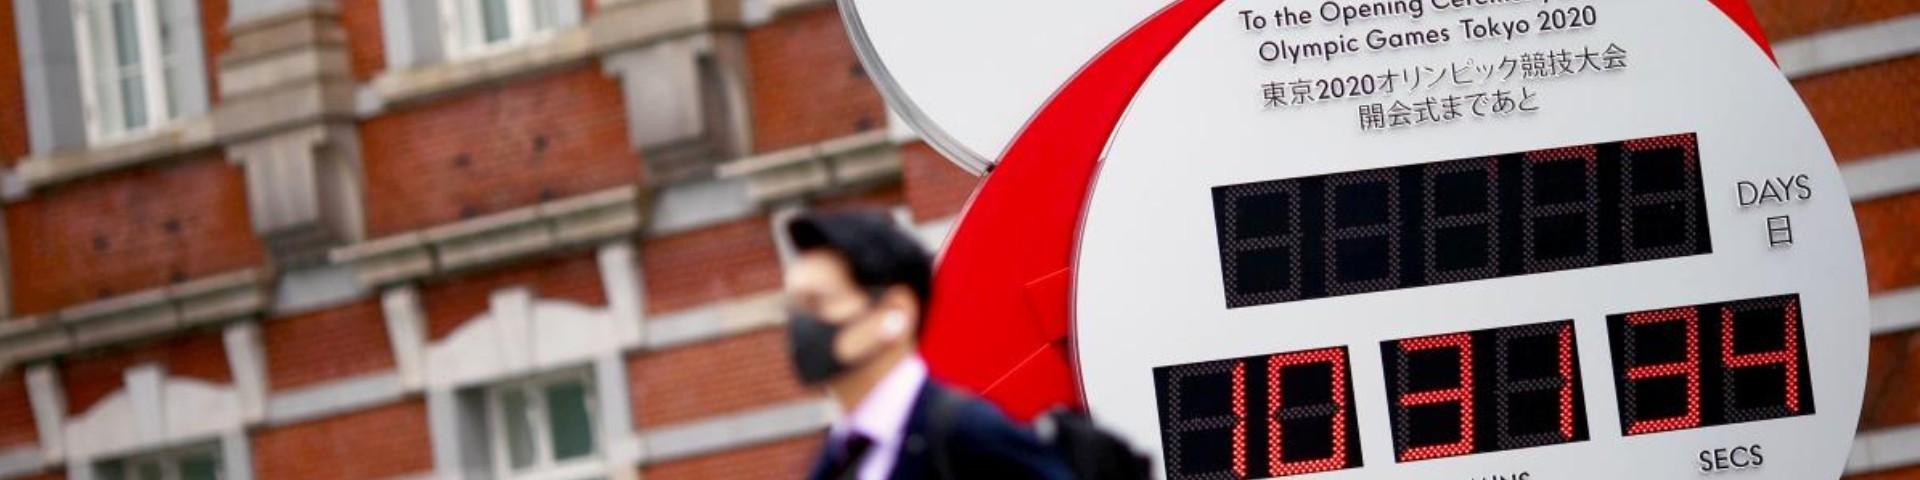 Олимпиада в Токио перенесена на год из-за коронавируса